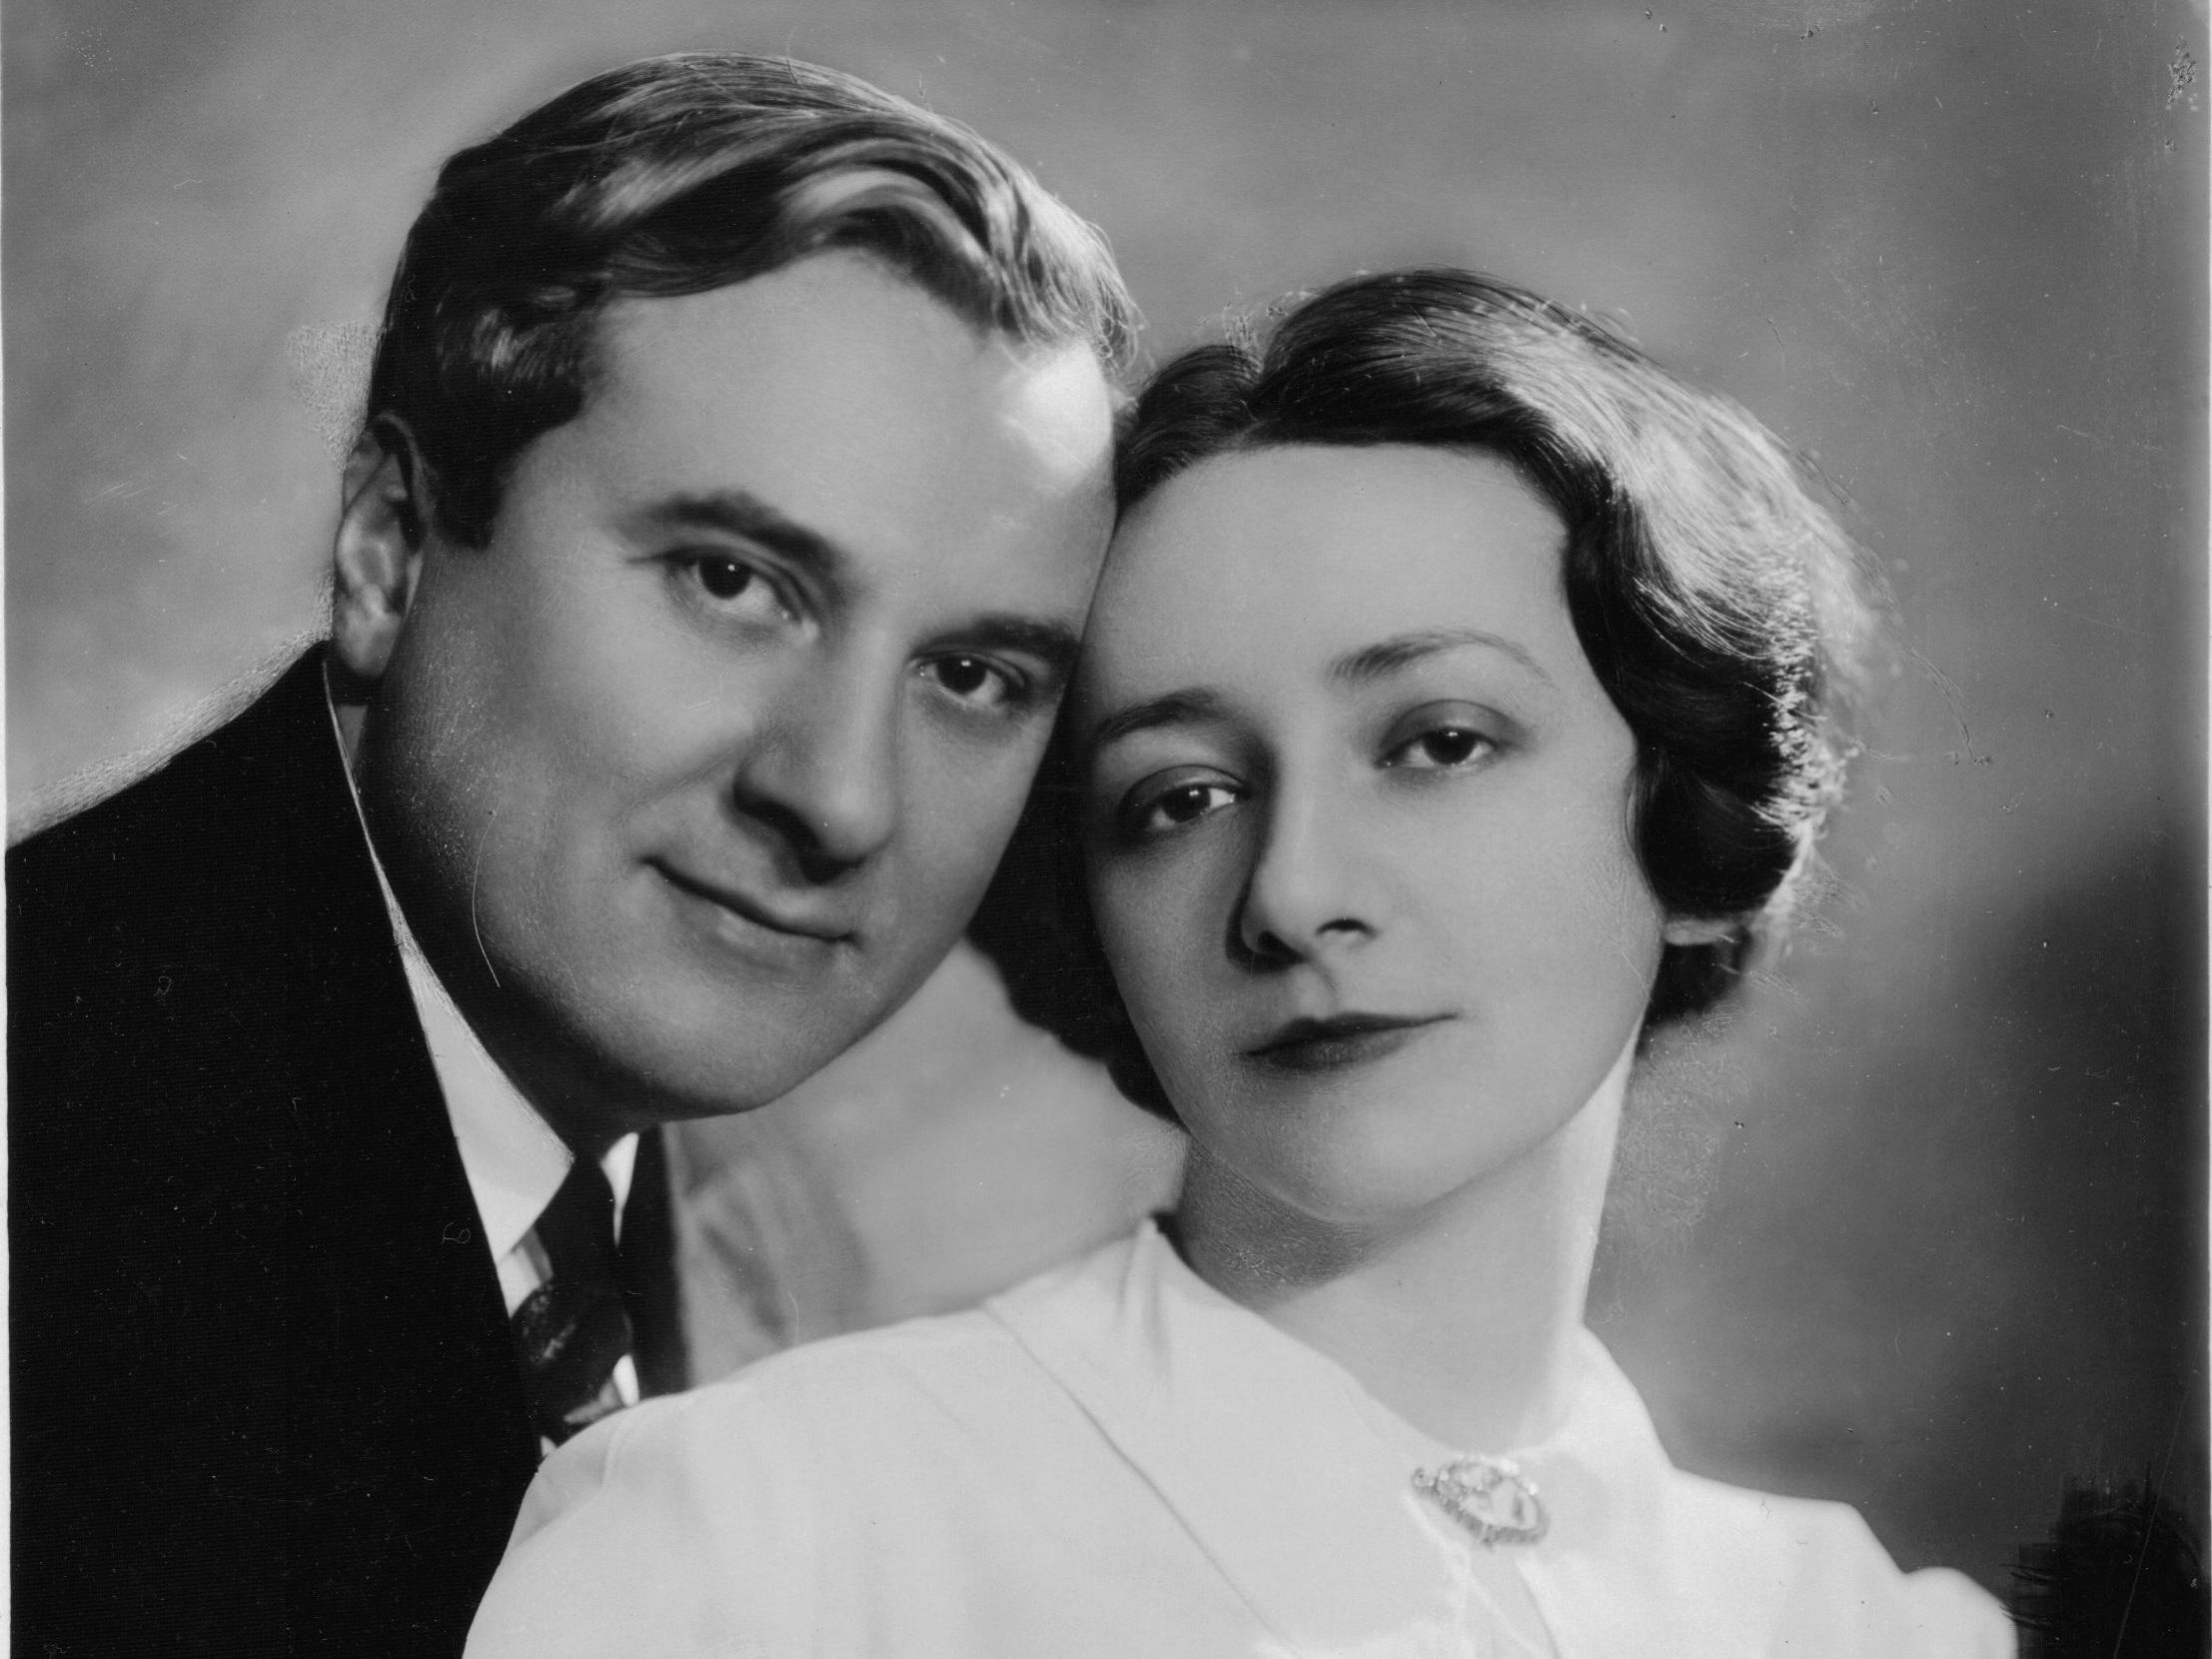 Pierre Luboshutz & Genia Nemenoff were Lea Luboshutz's brother and sister-in-law respectively.